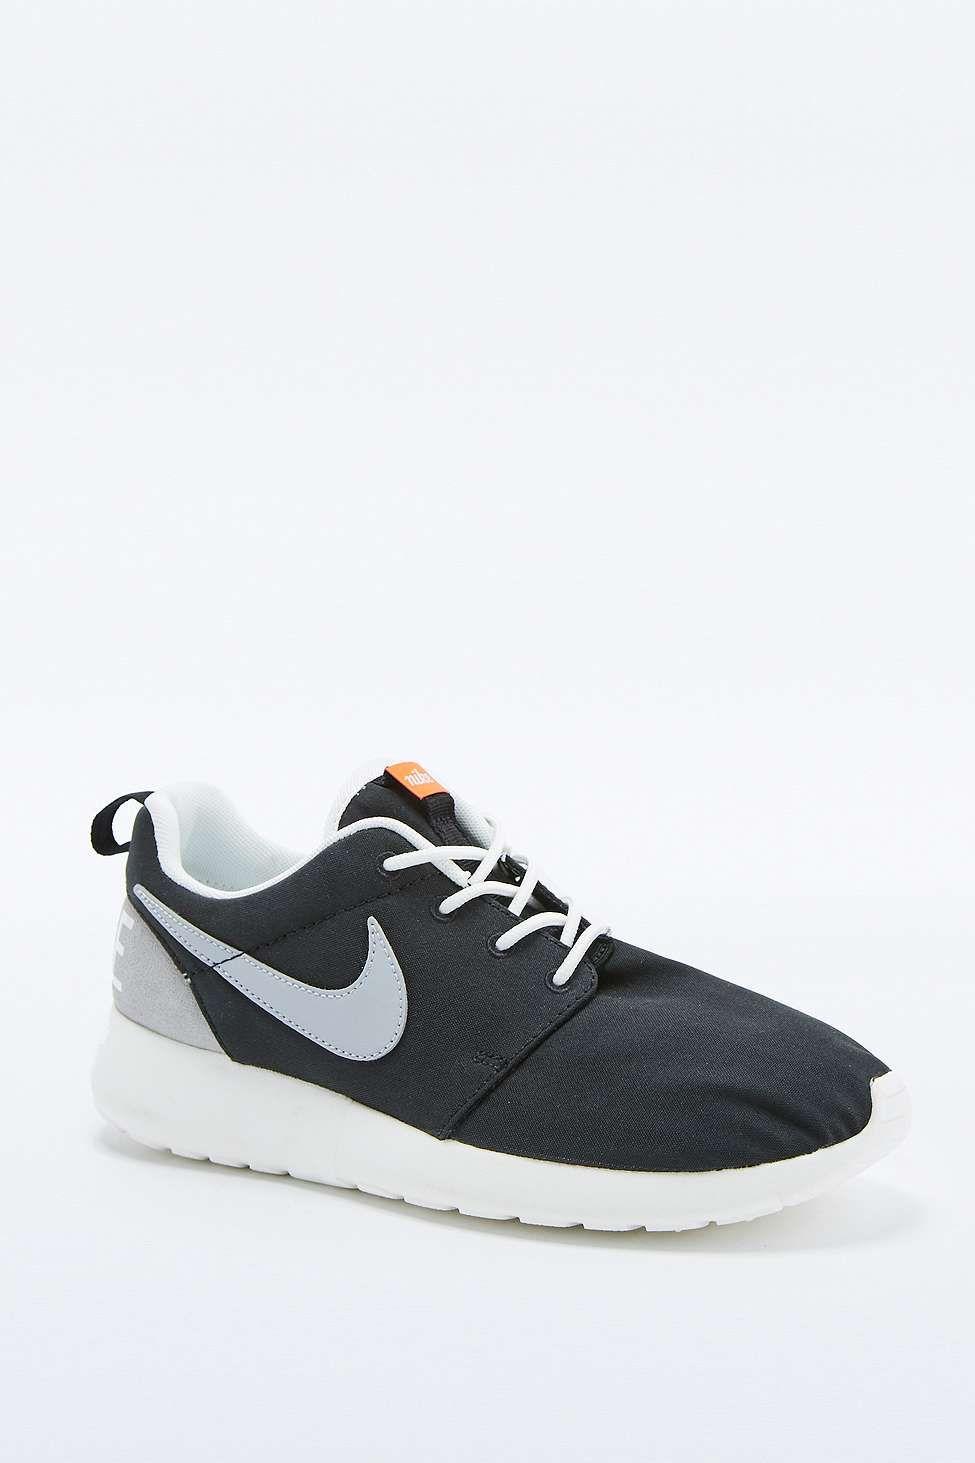 20c425507d46 Nike Roshe Run Retro Black and White Trainers   C L O T H E S ...